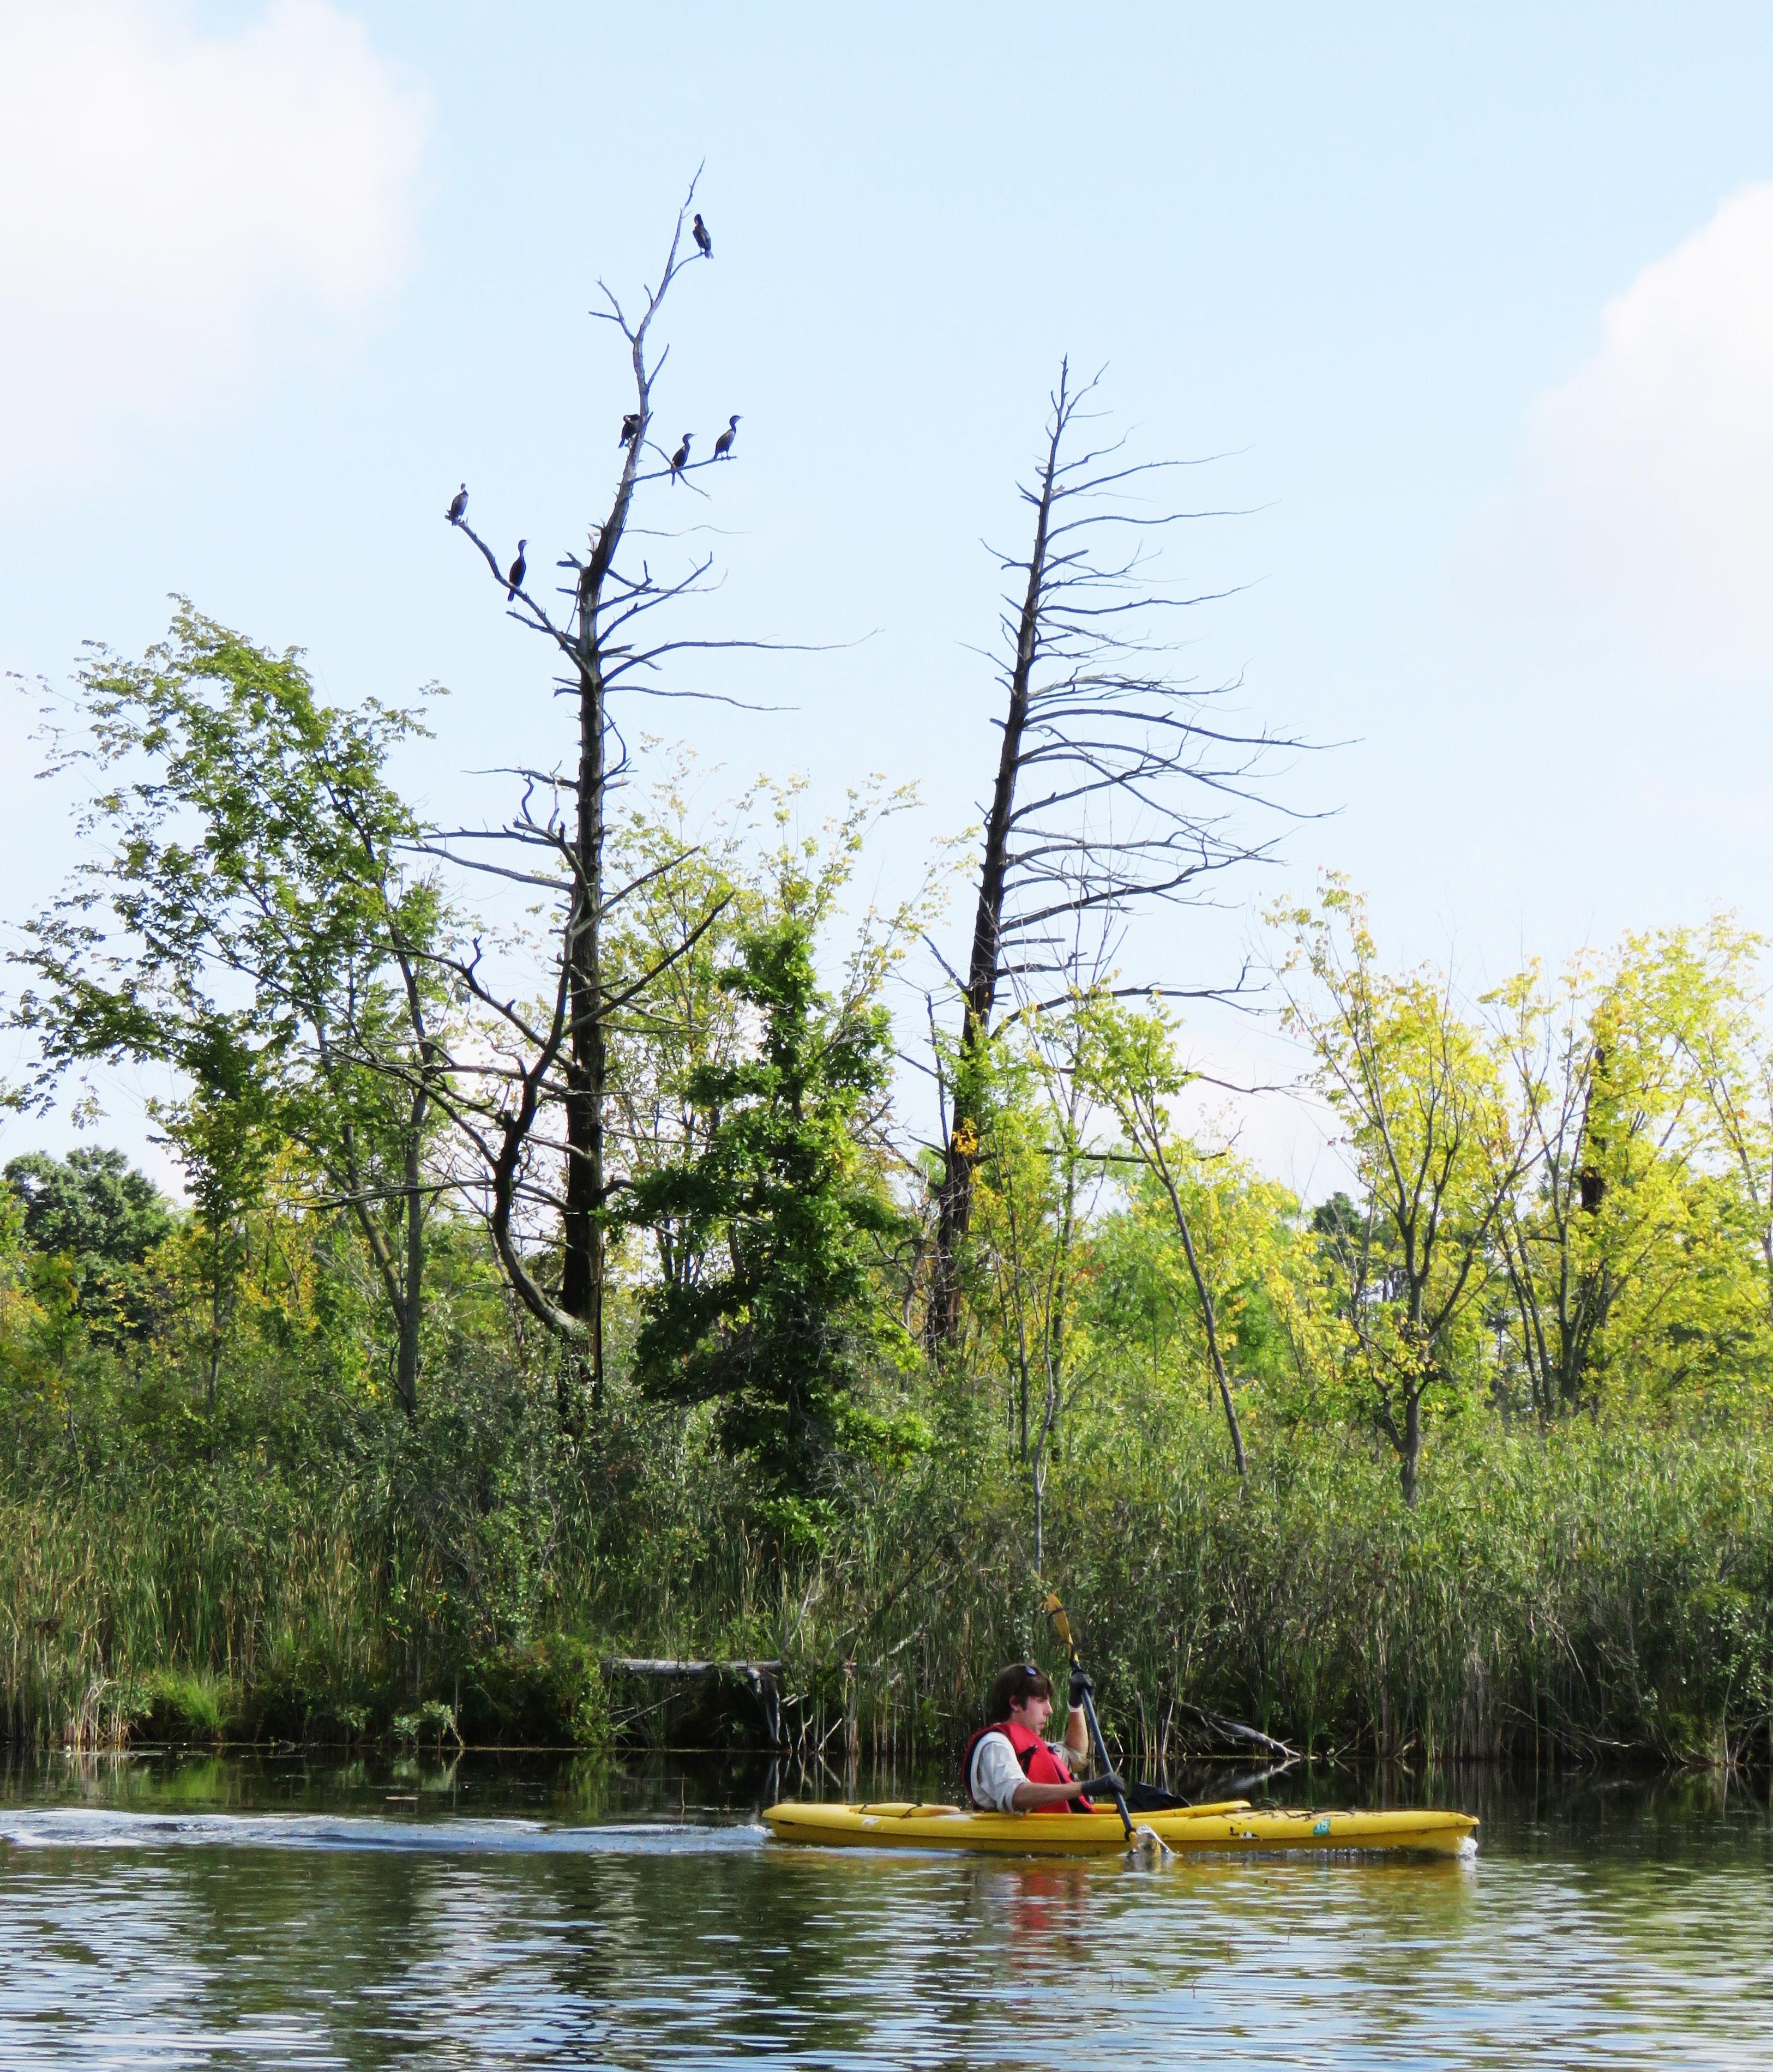 A kayaker paddles in a lake